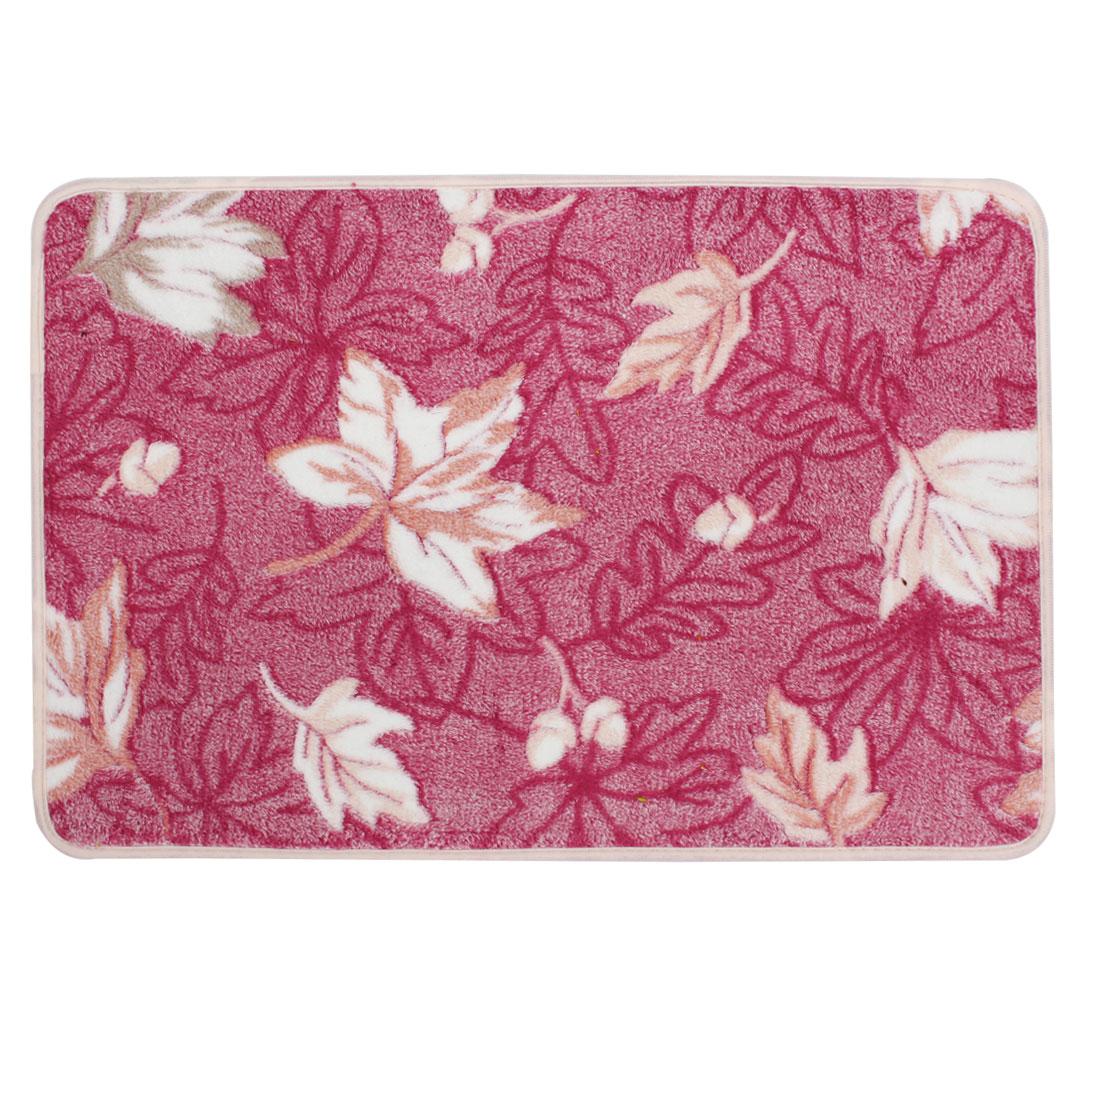 Red Maple Leaves Patetrn Bedroom Floor Mat Area Rug Carpet 60cm x 40cm